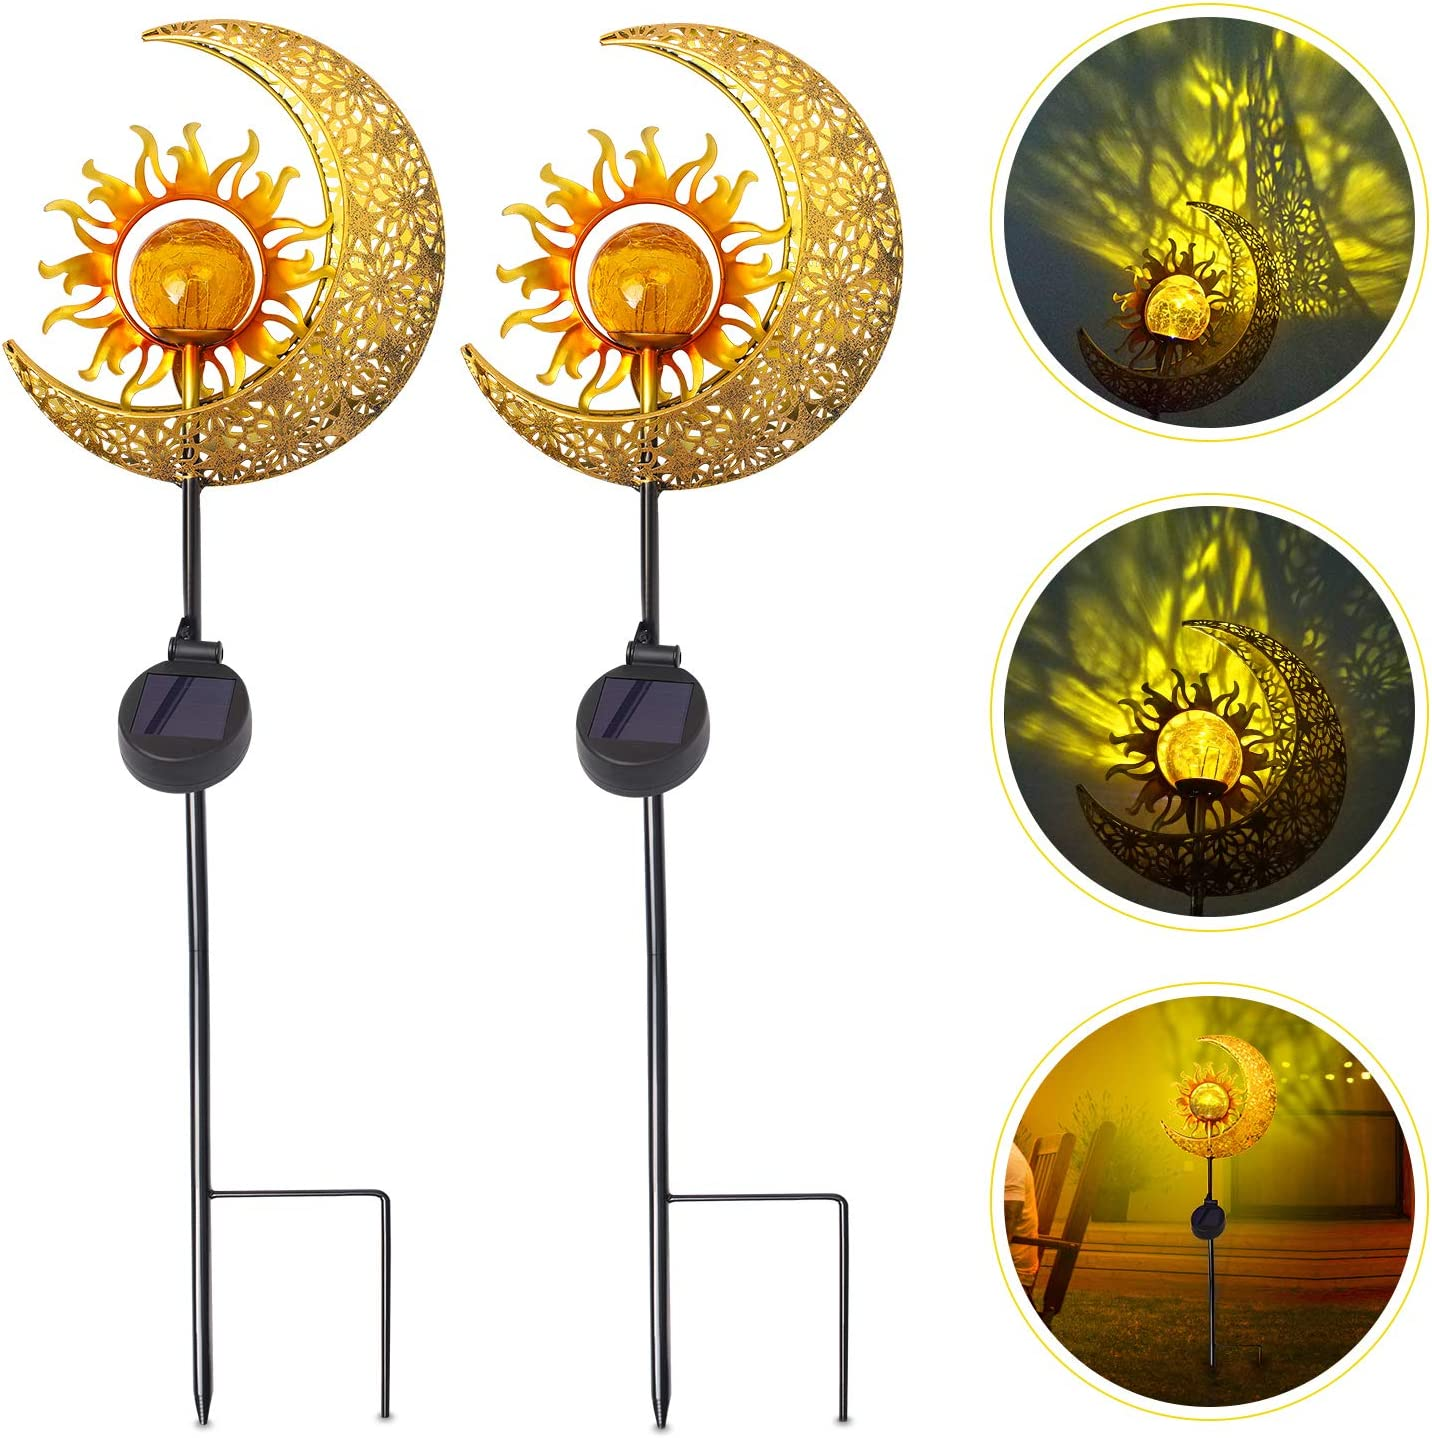 Kyson Sun Moon Solar LightsGardenOutdoor Waterproof Metal DecorativeStakes CrackleGlassGlobe Warm White LED for Walkway,Yard,Lawn,Patio (2 Pack)